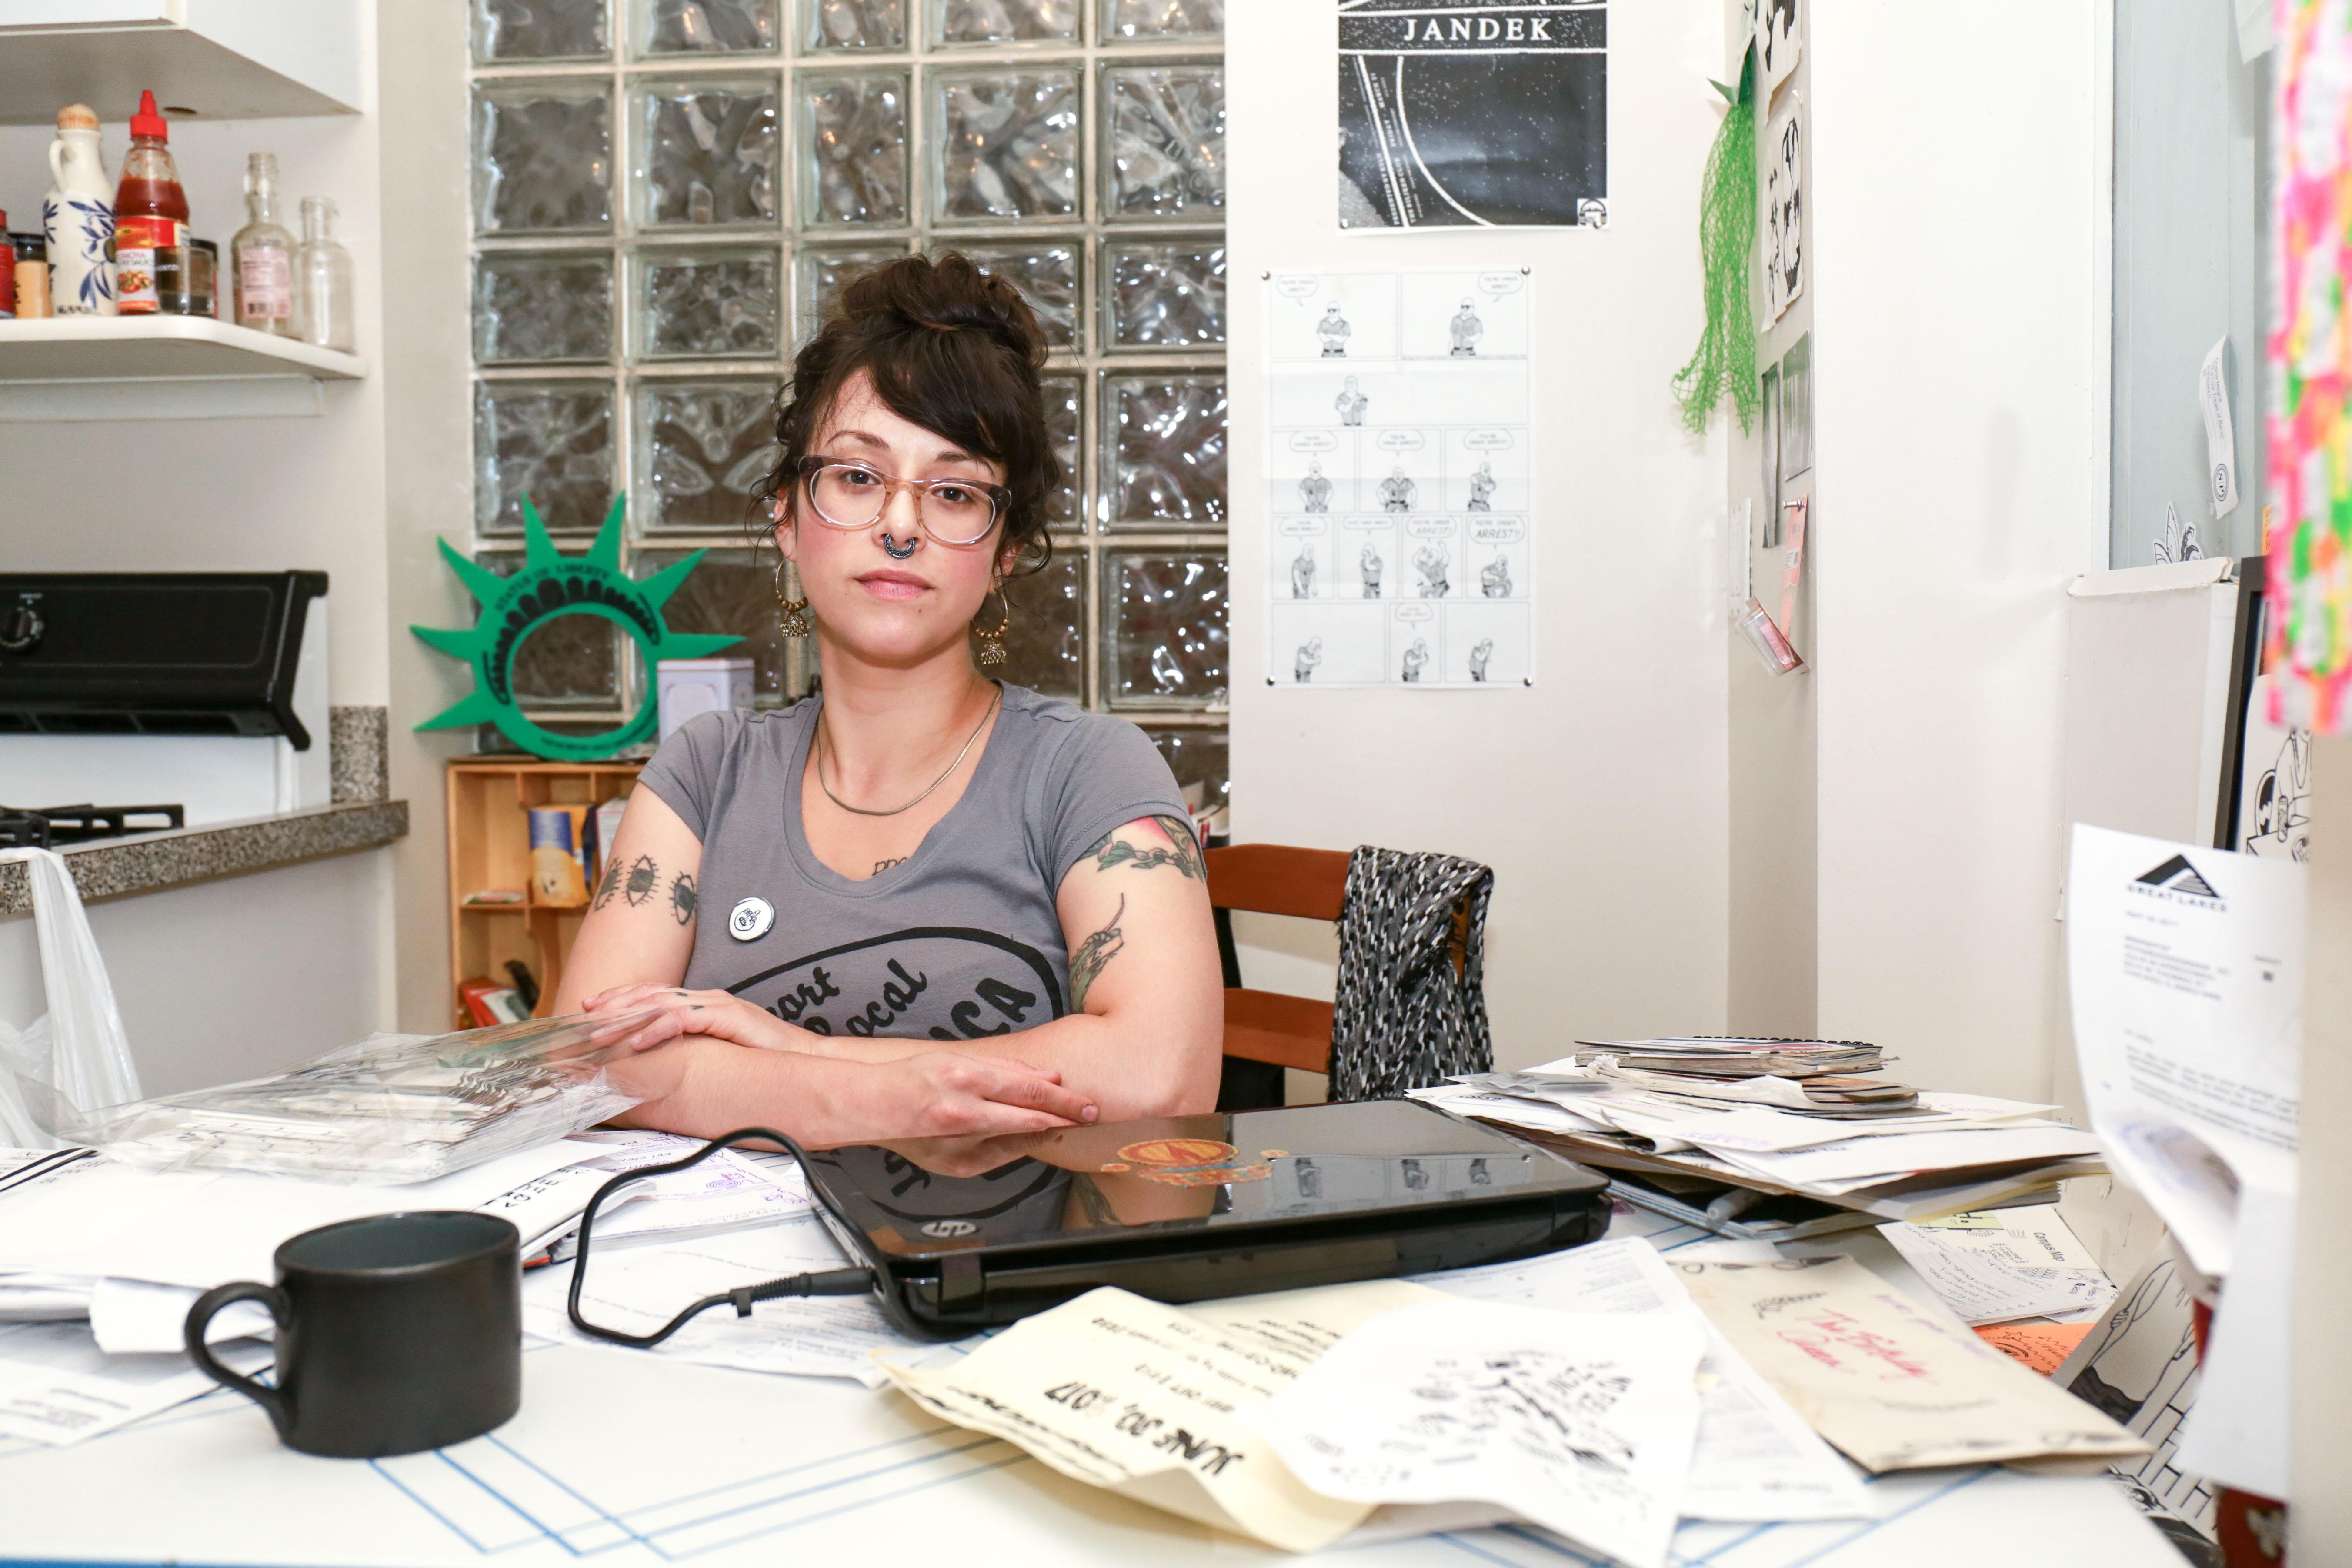 Meet Julia Arredondo, the Tejana Artist Running an Online Bodega Inspired by Modern Curanderismo